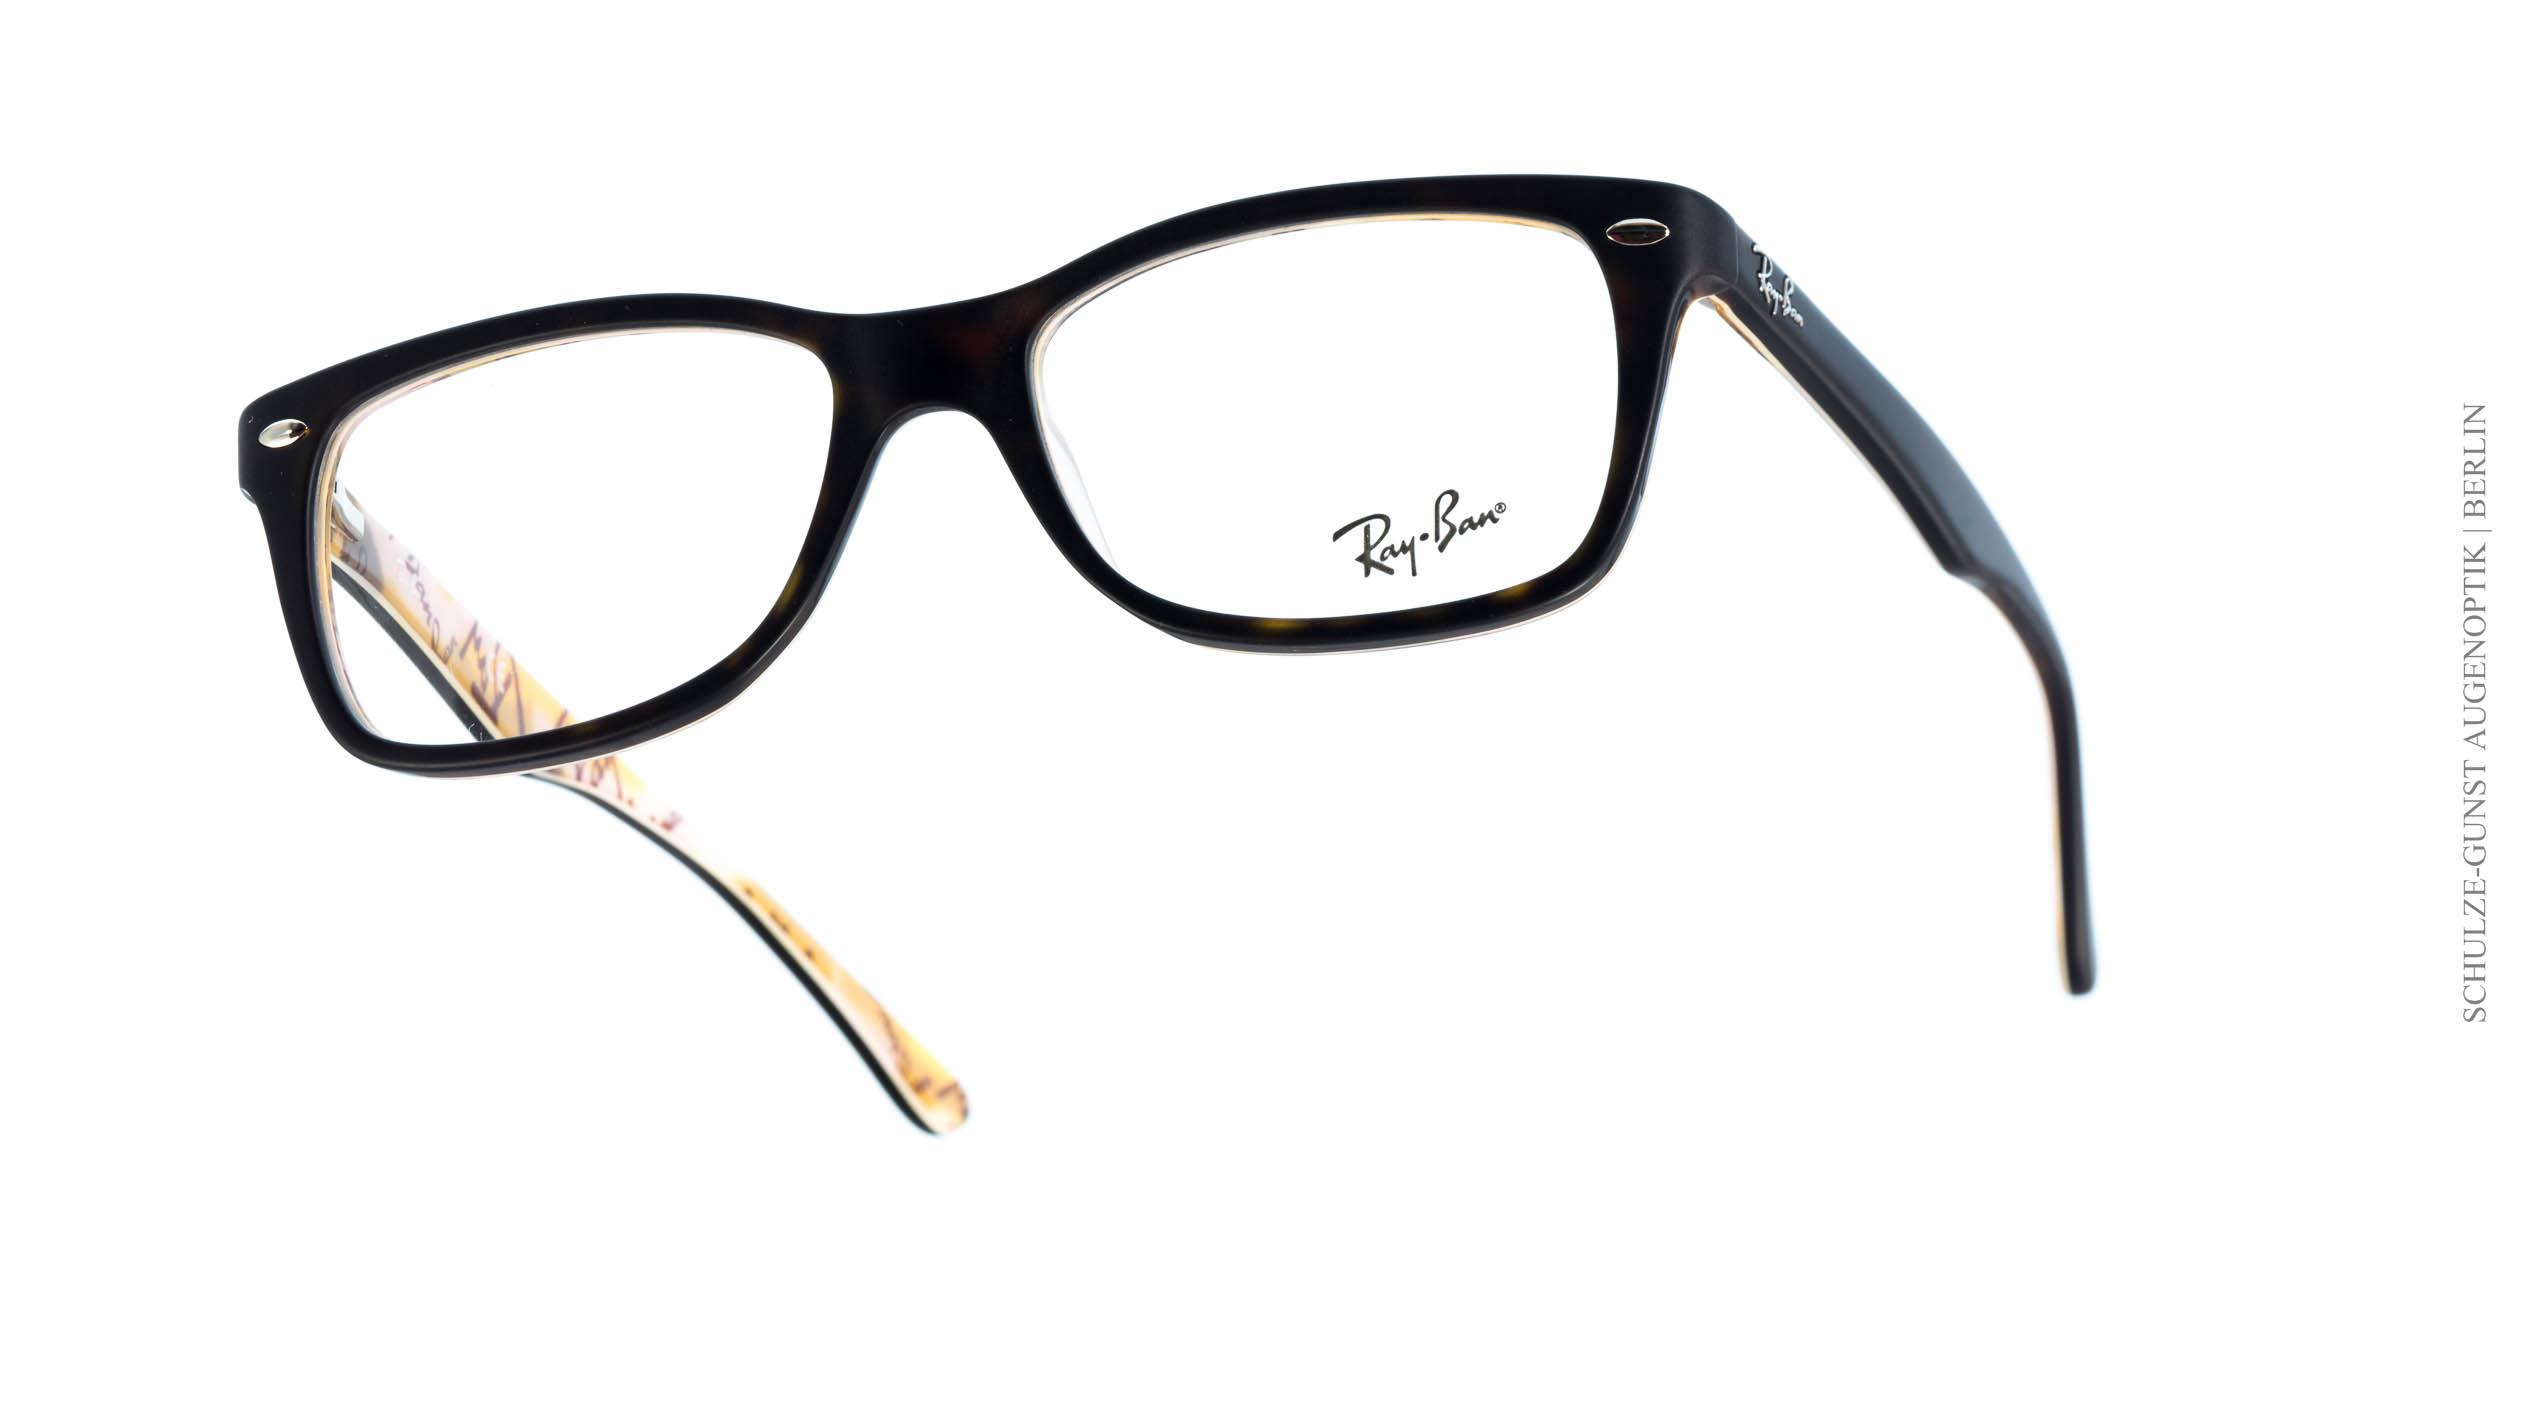 8064-ray-ban-rb-5228-brillen-kunststoff-